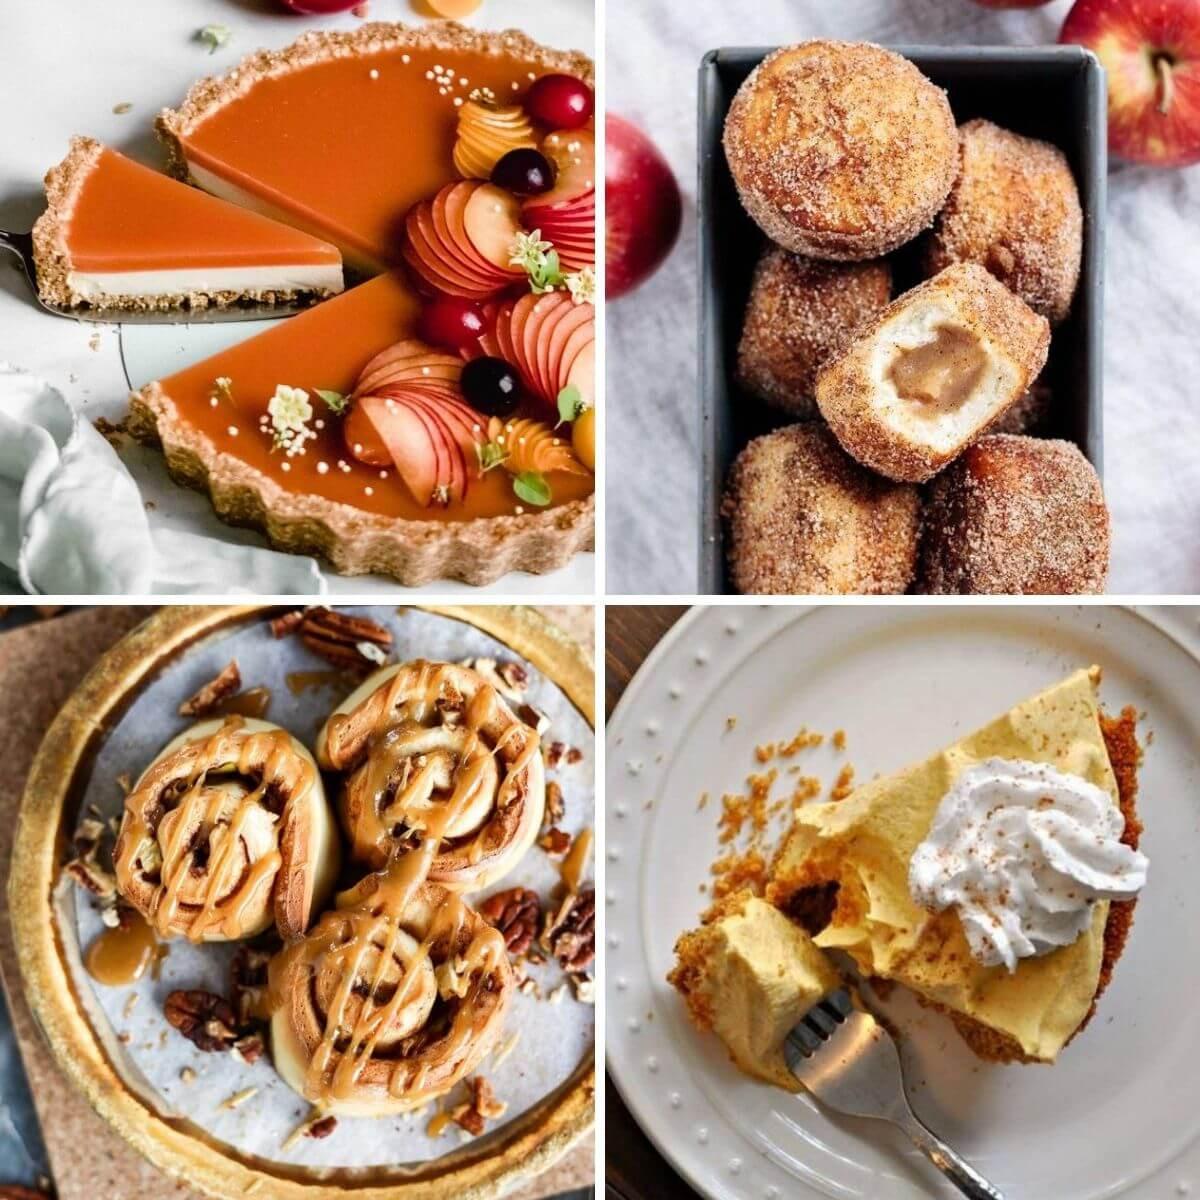 Vegan Fall Desserts  30 Heavenly Vegan Fall Dessert Recipes